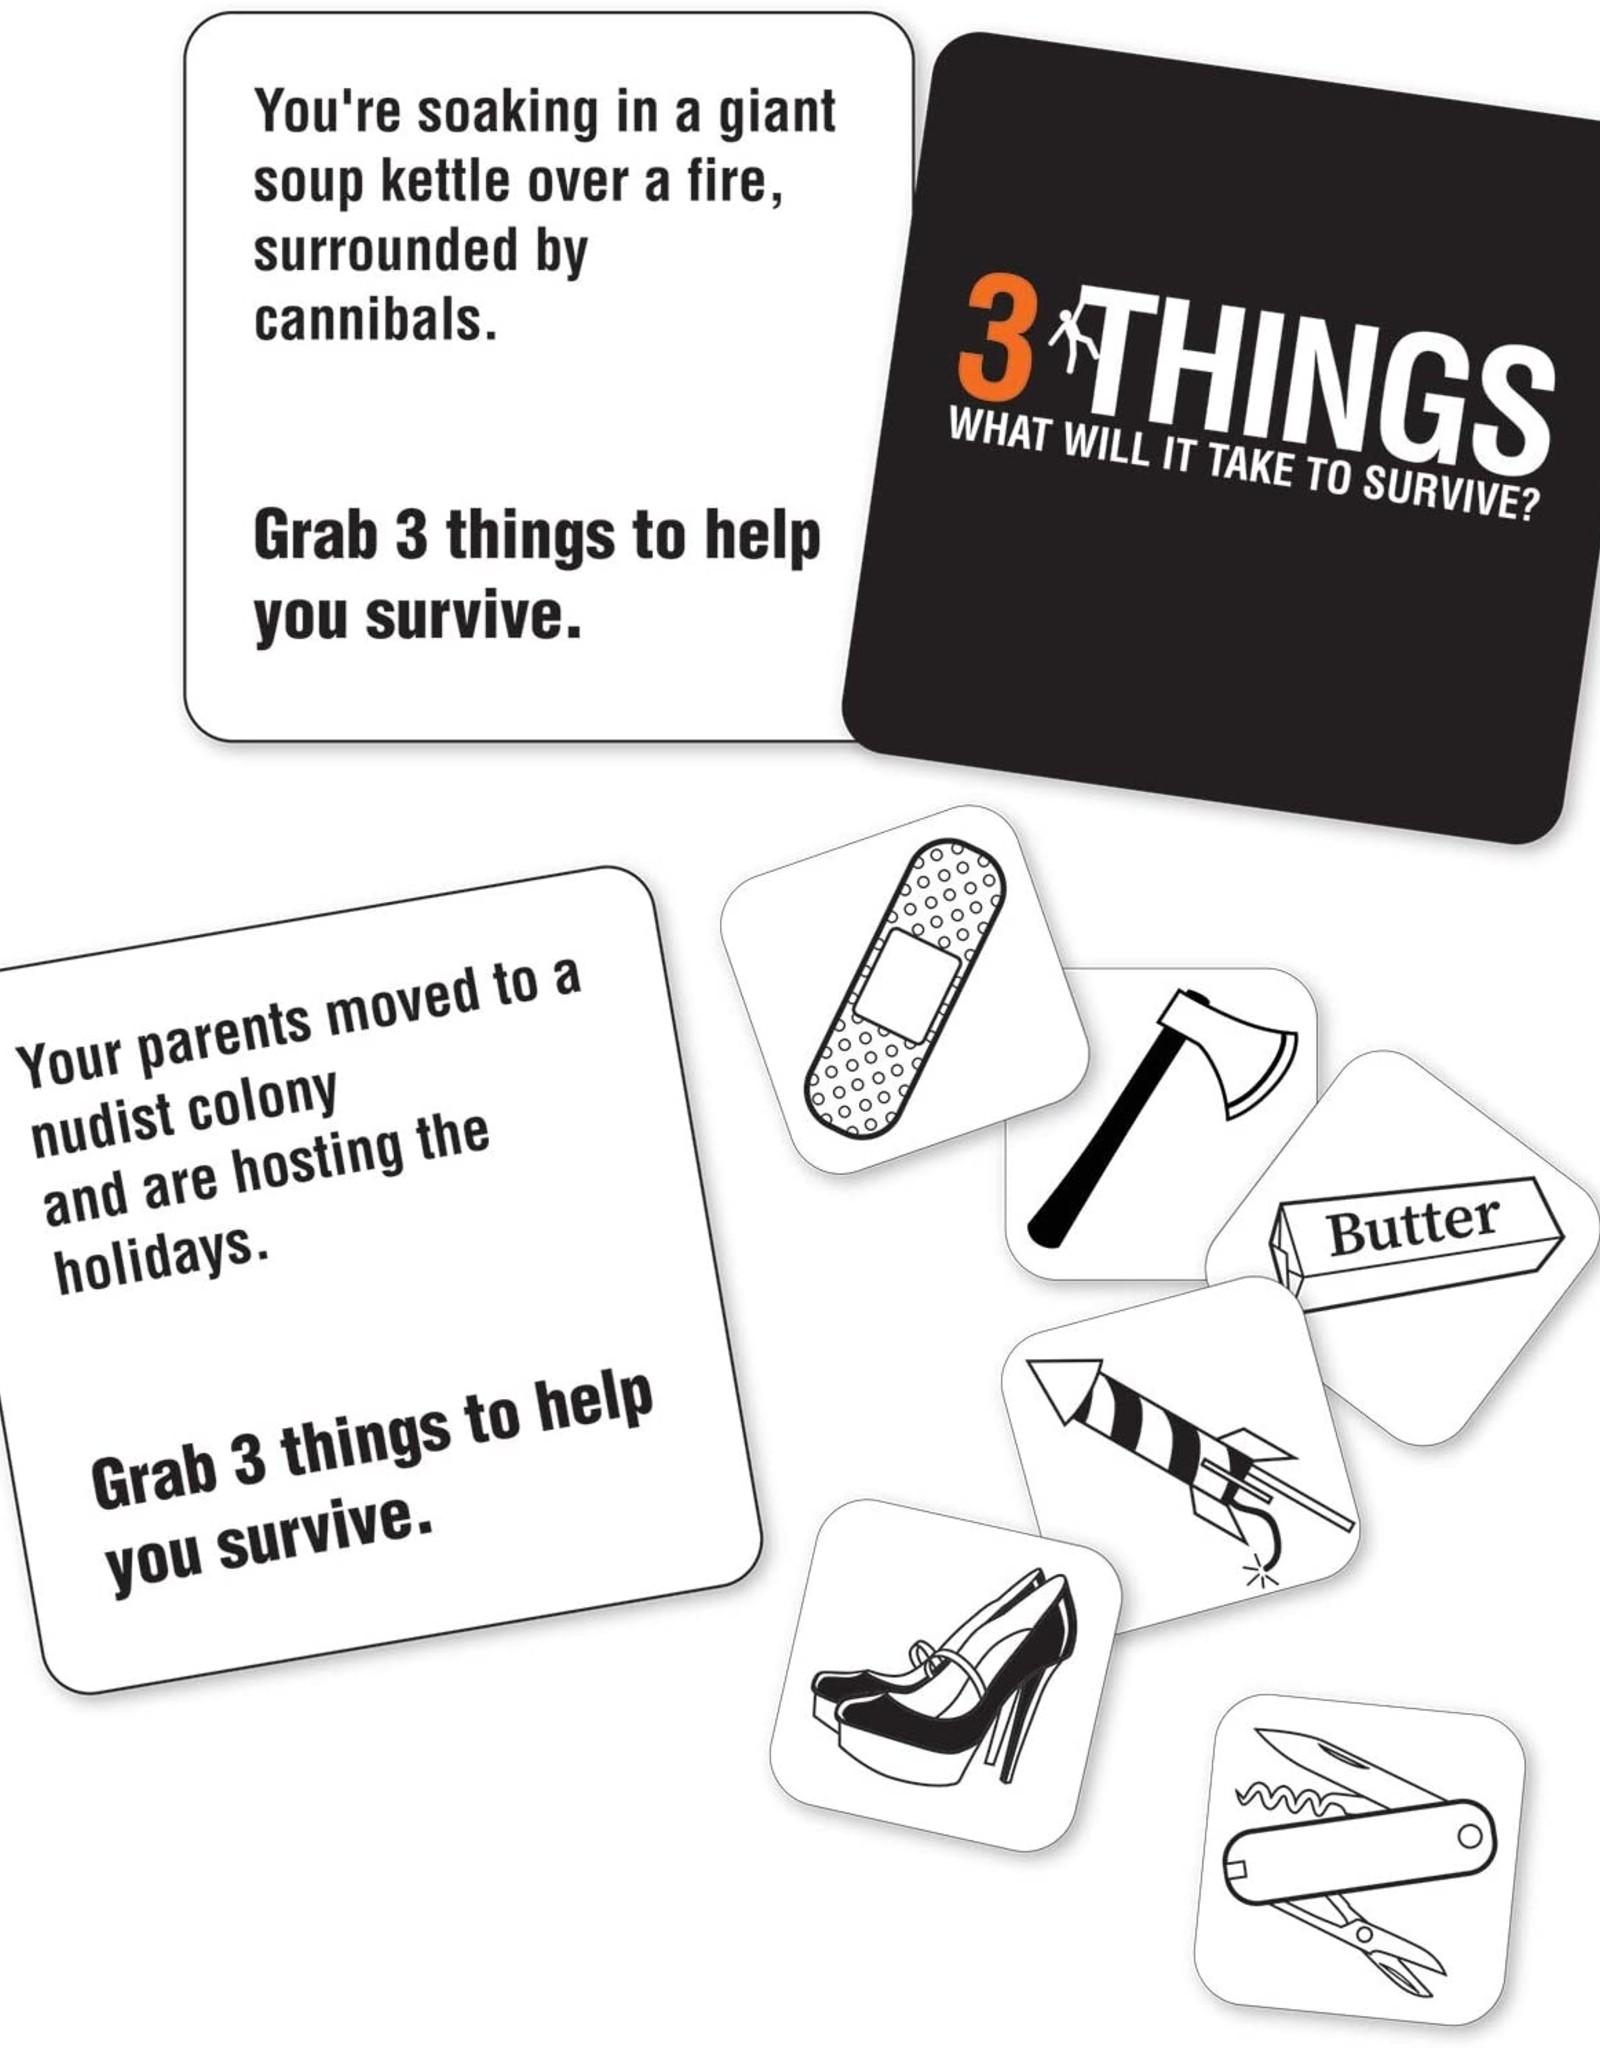 3 Things Game